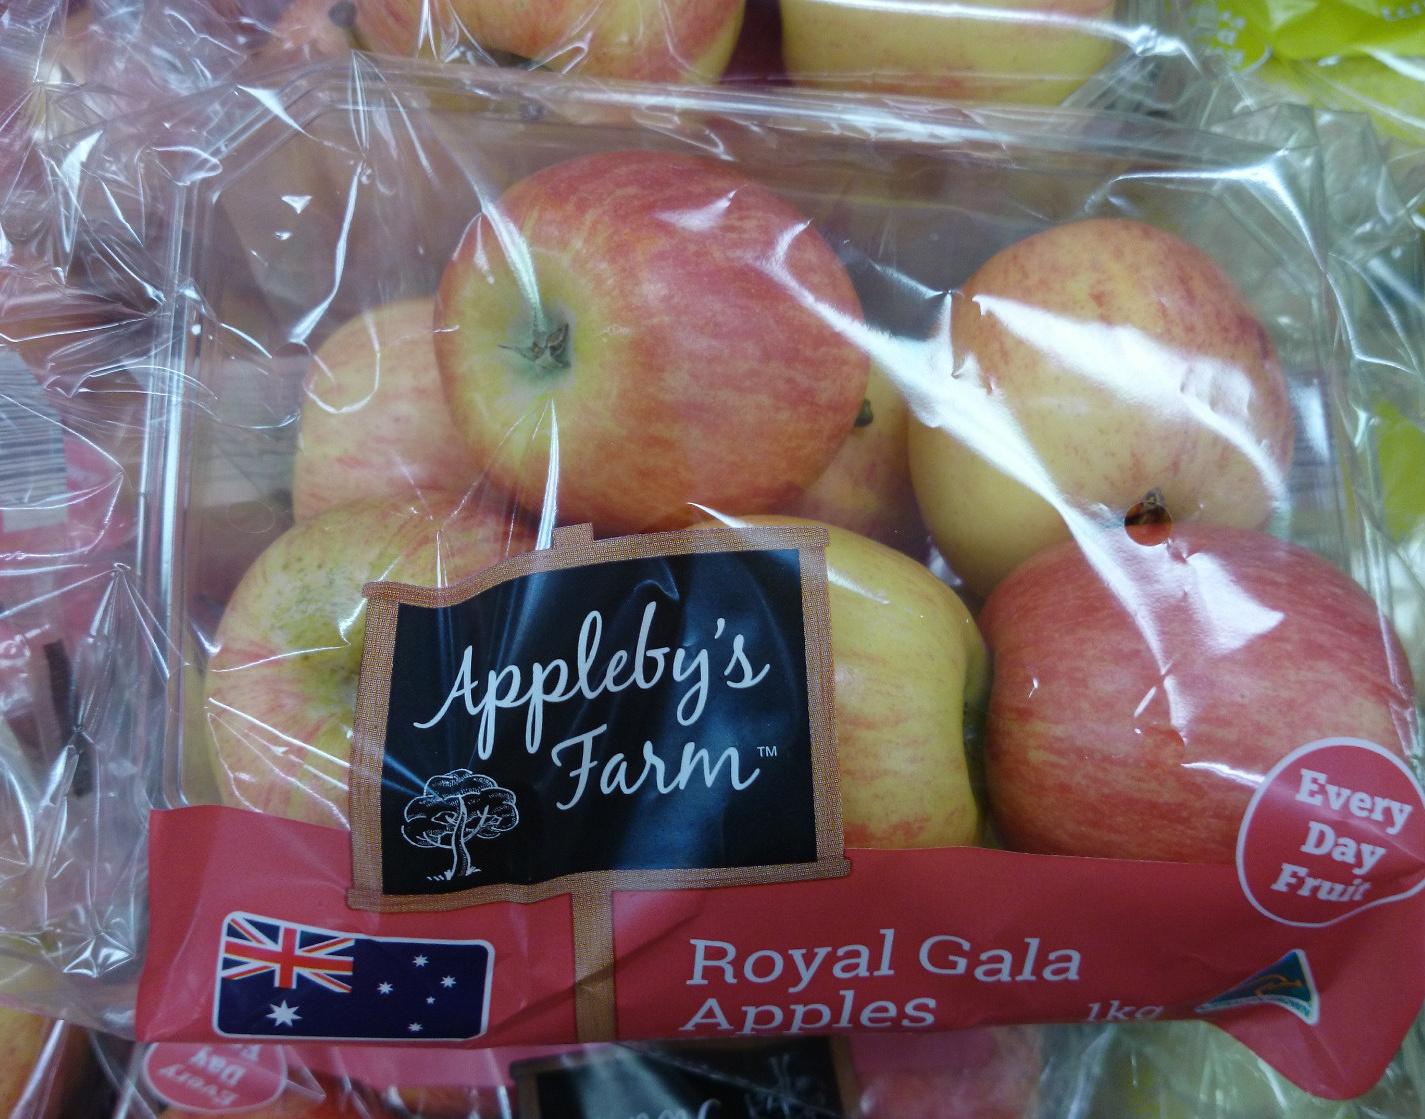 Royal Gala Apples - Product